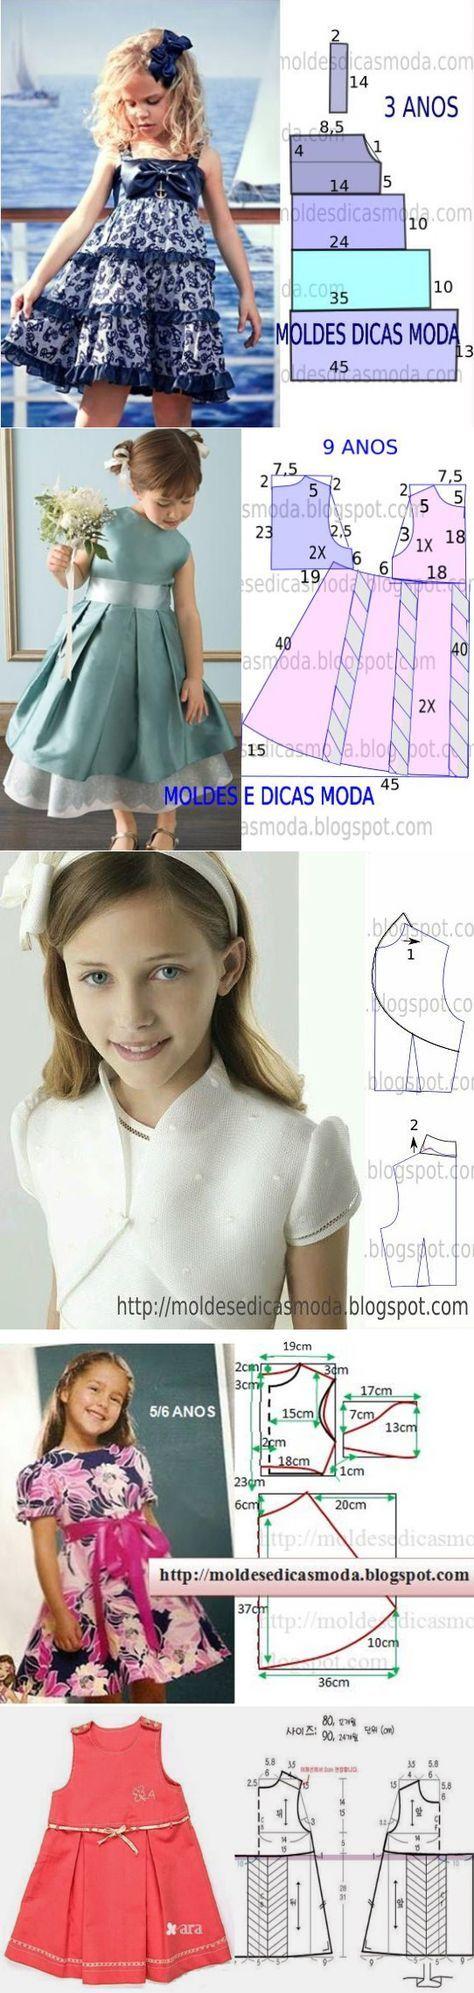 Simulation children's clothing. (40chast) // Галина Моисеева